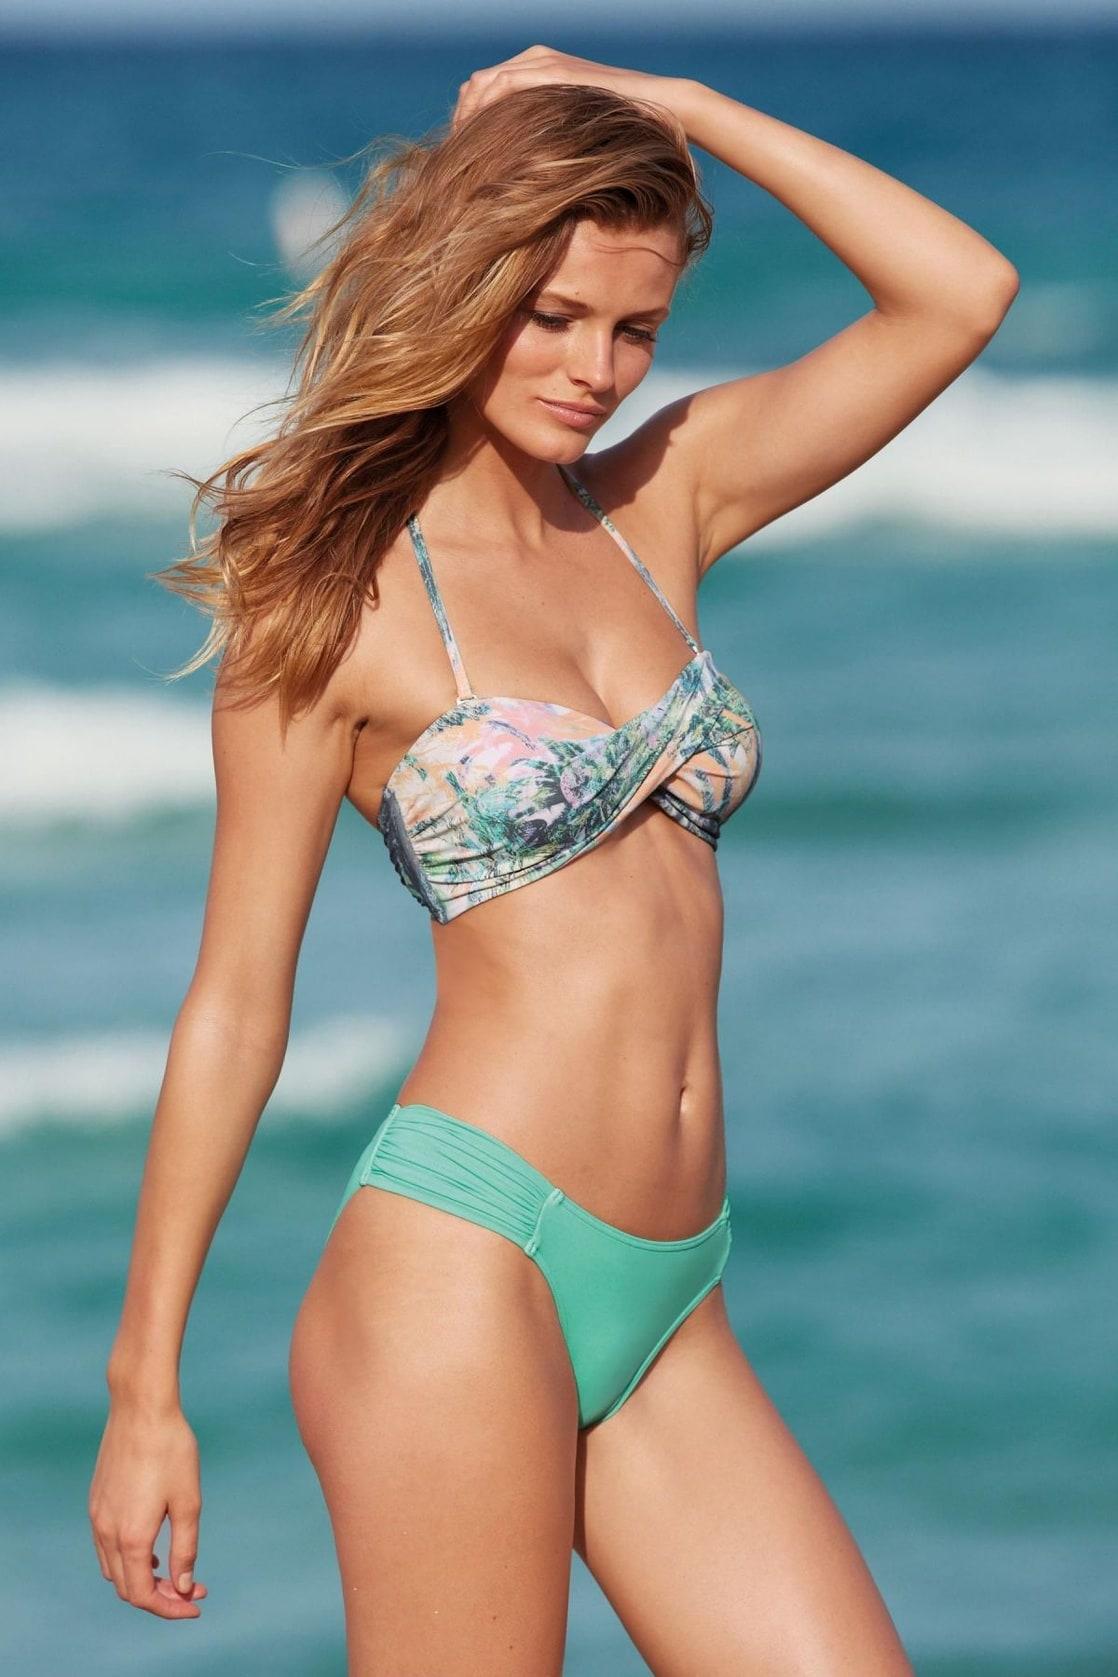 Bikini Edita Vilkeviciute nudes (48 photo), Tits, Cleavage, Twitter, underwear 2020